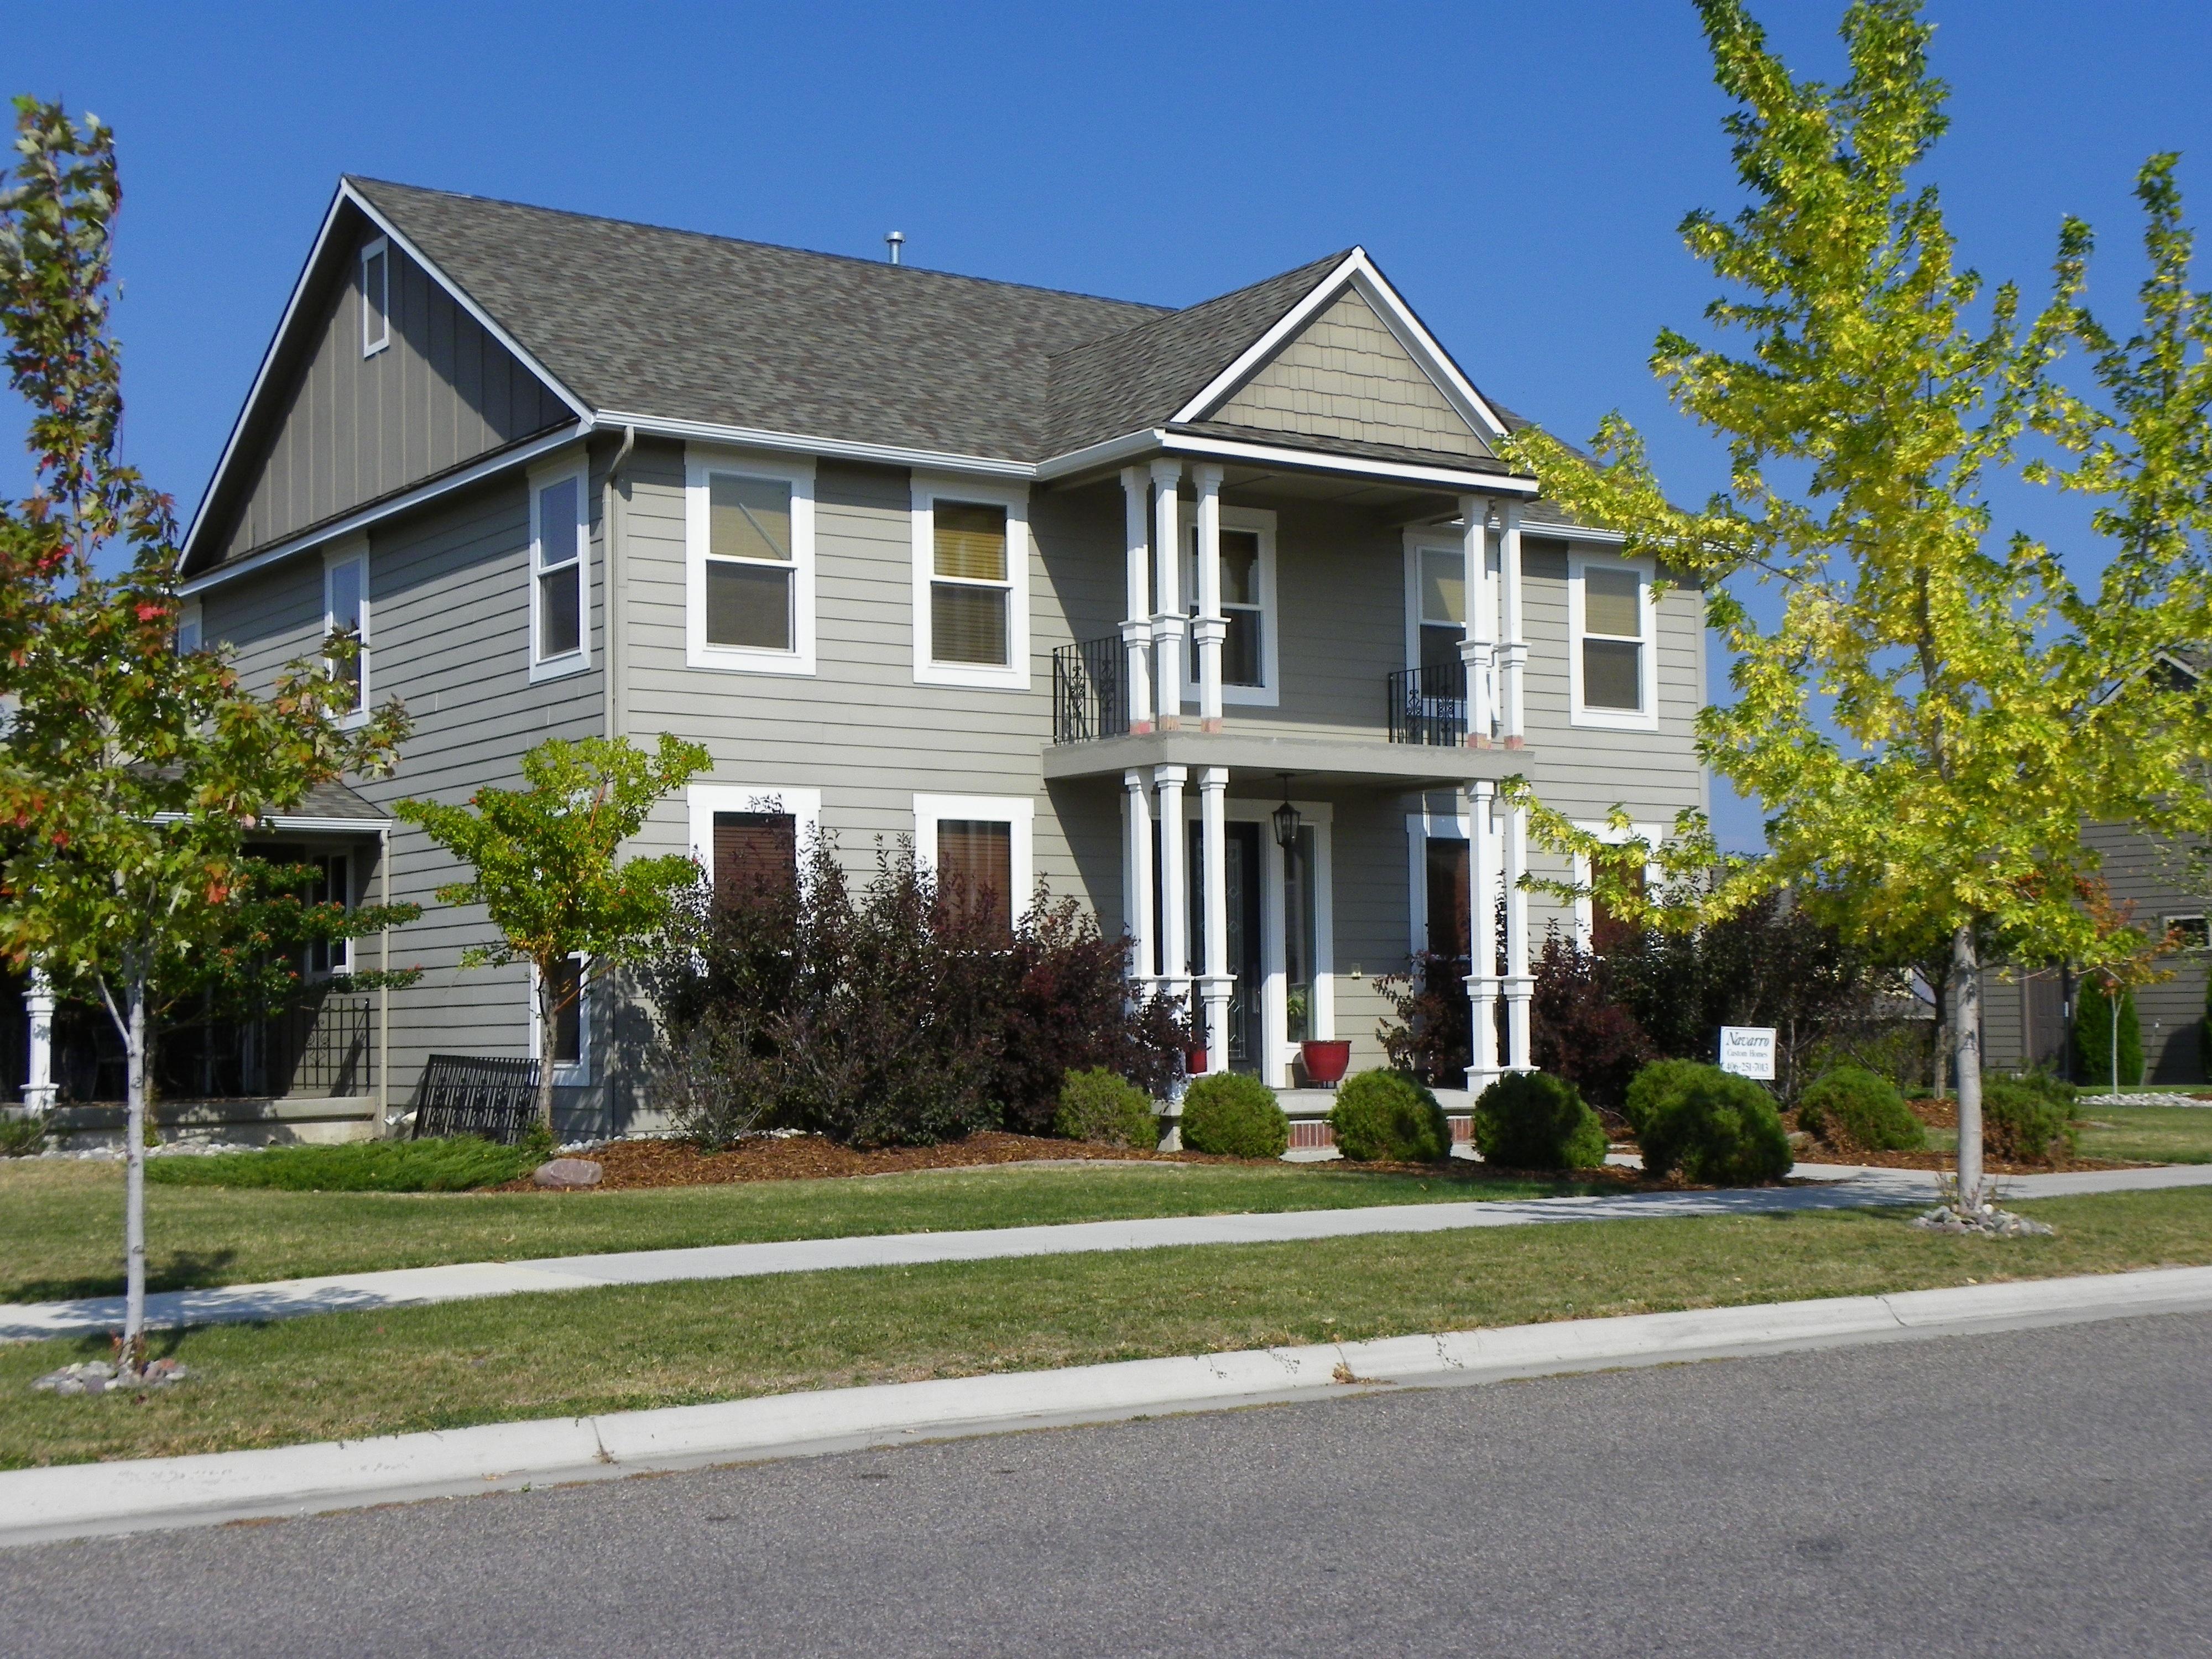 Free images lawn house roof building asphalt suburb cottage suburban america facade - Houses attic families children ...